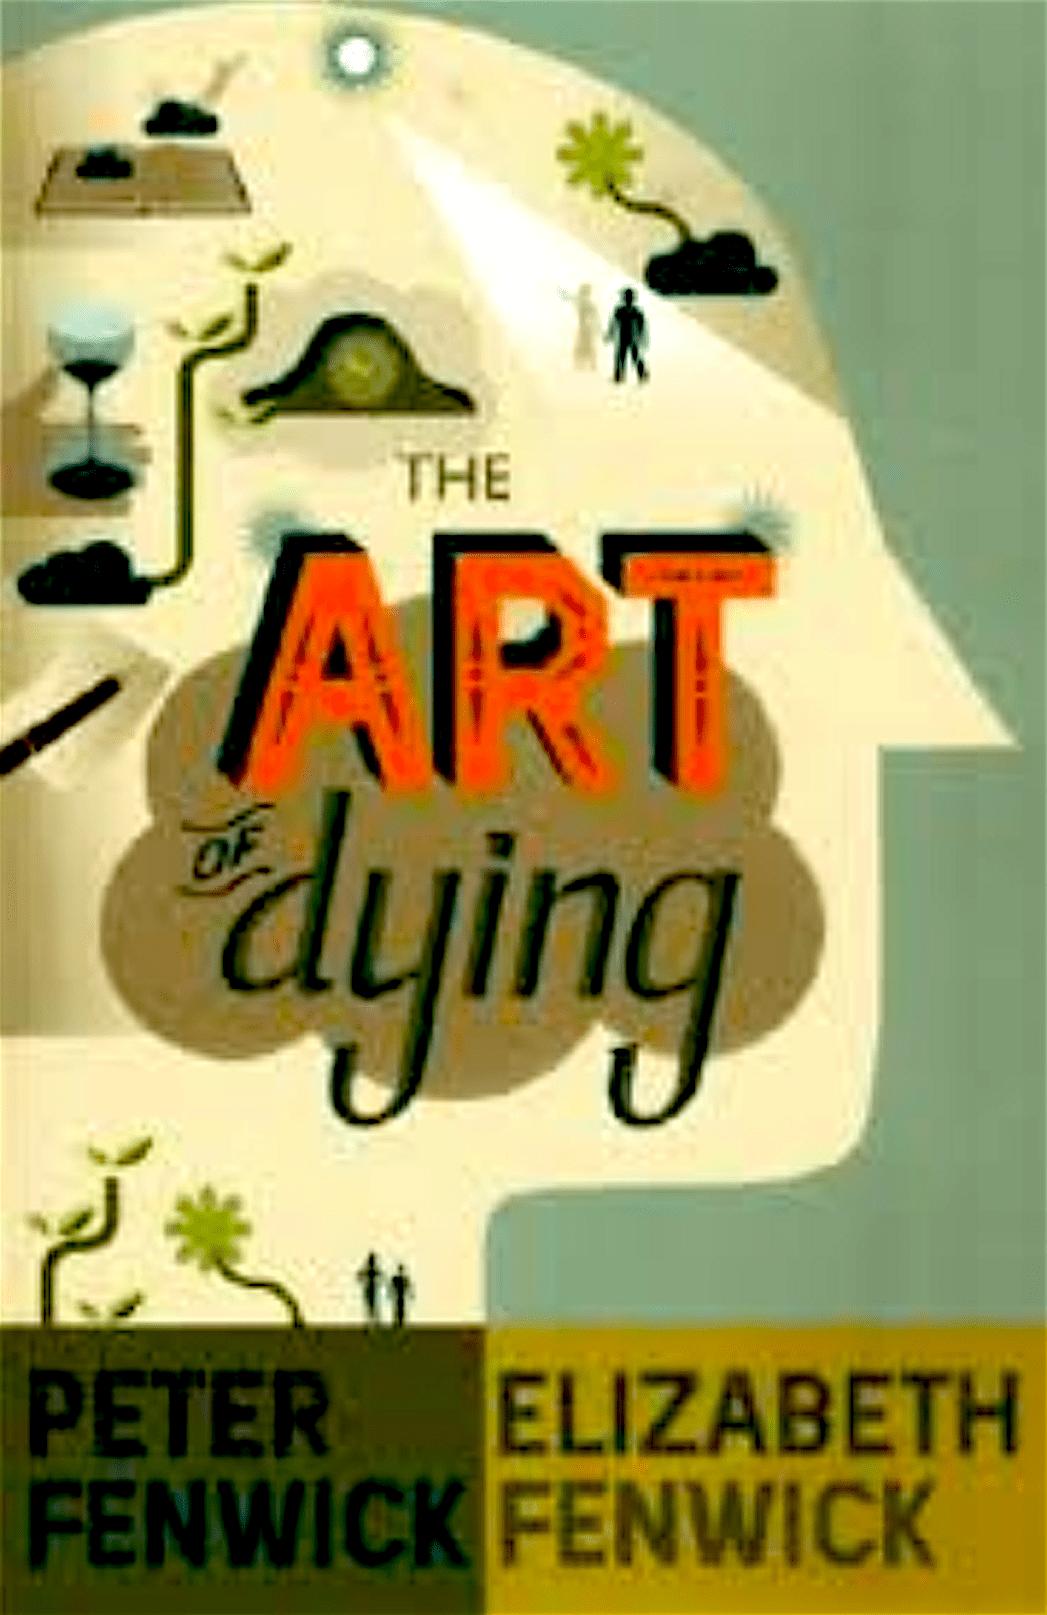 Lees mee met Micha Kat: Peter & Elizabeth Fenwick | The Art of Dying